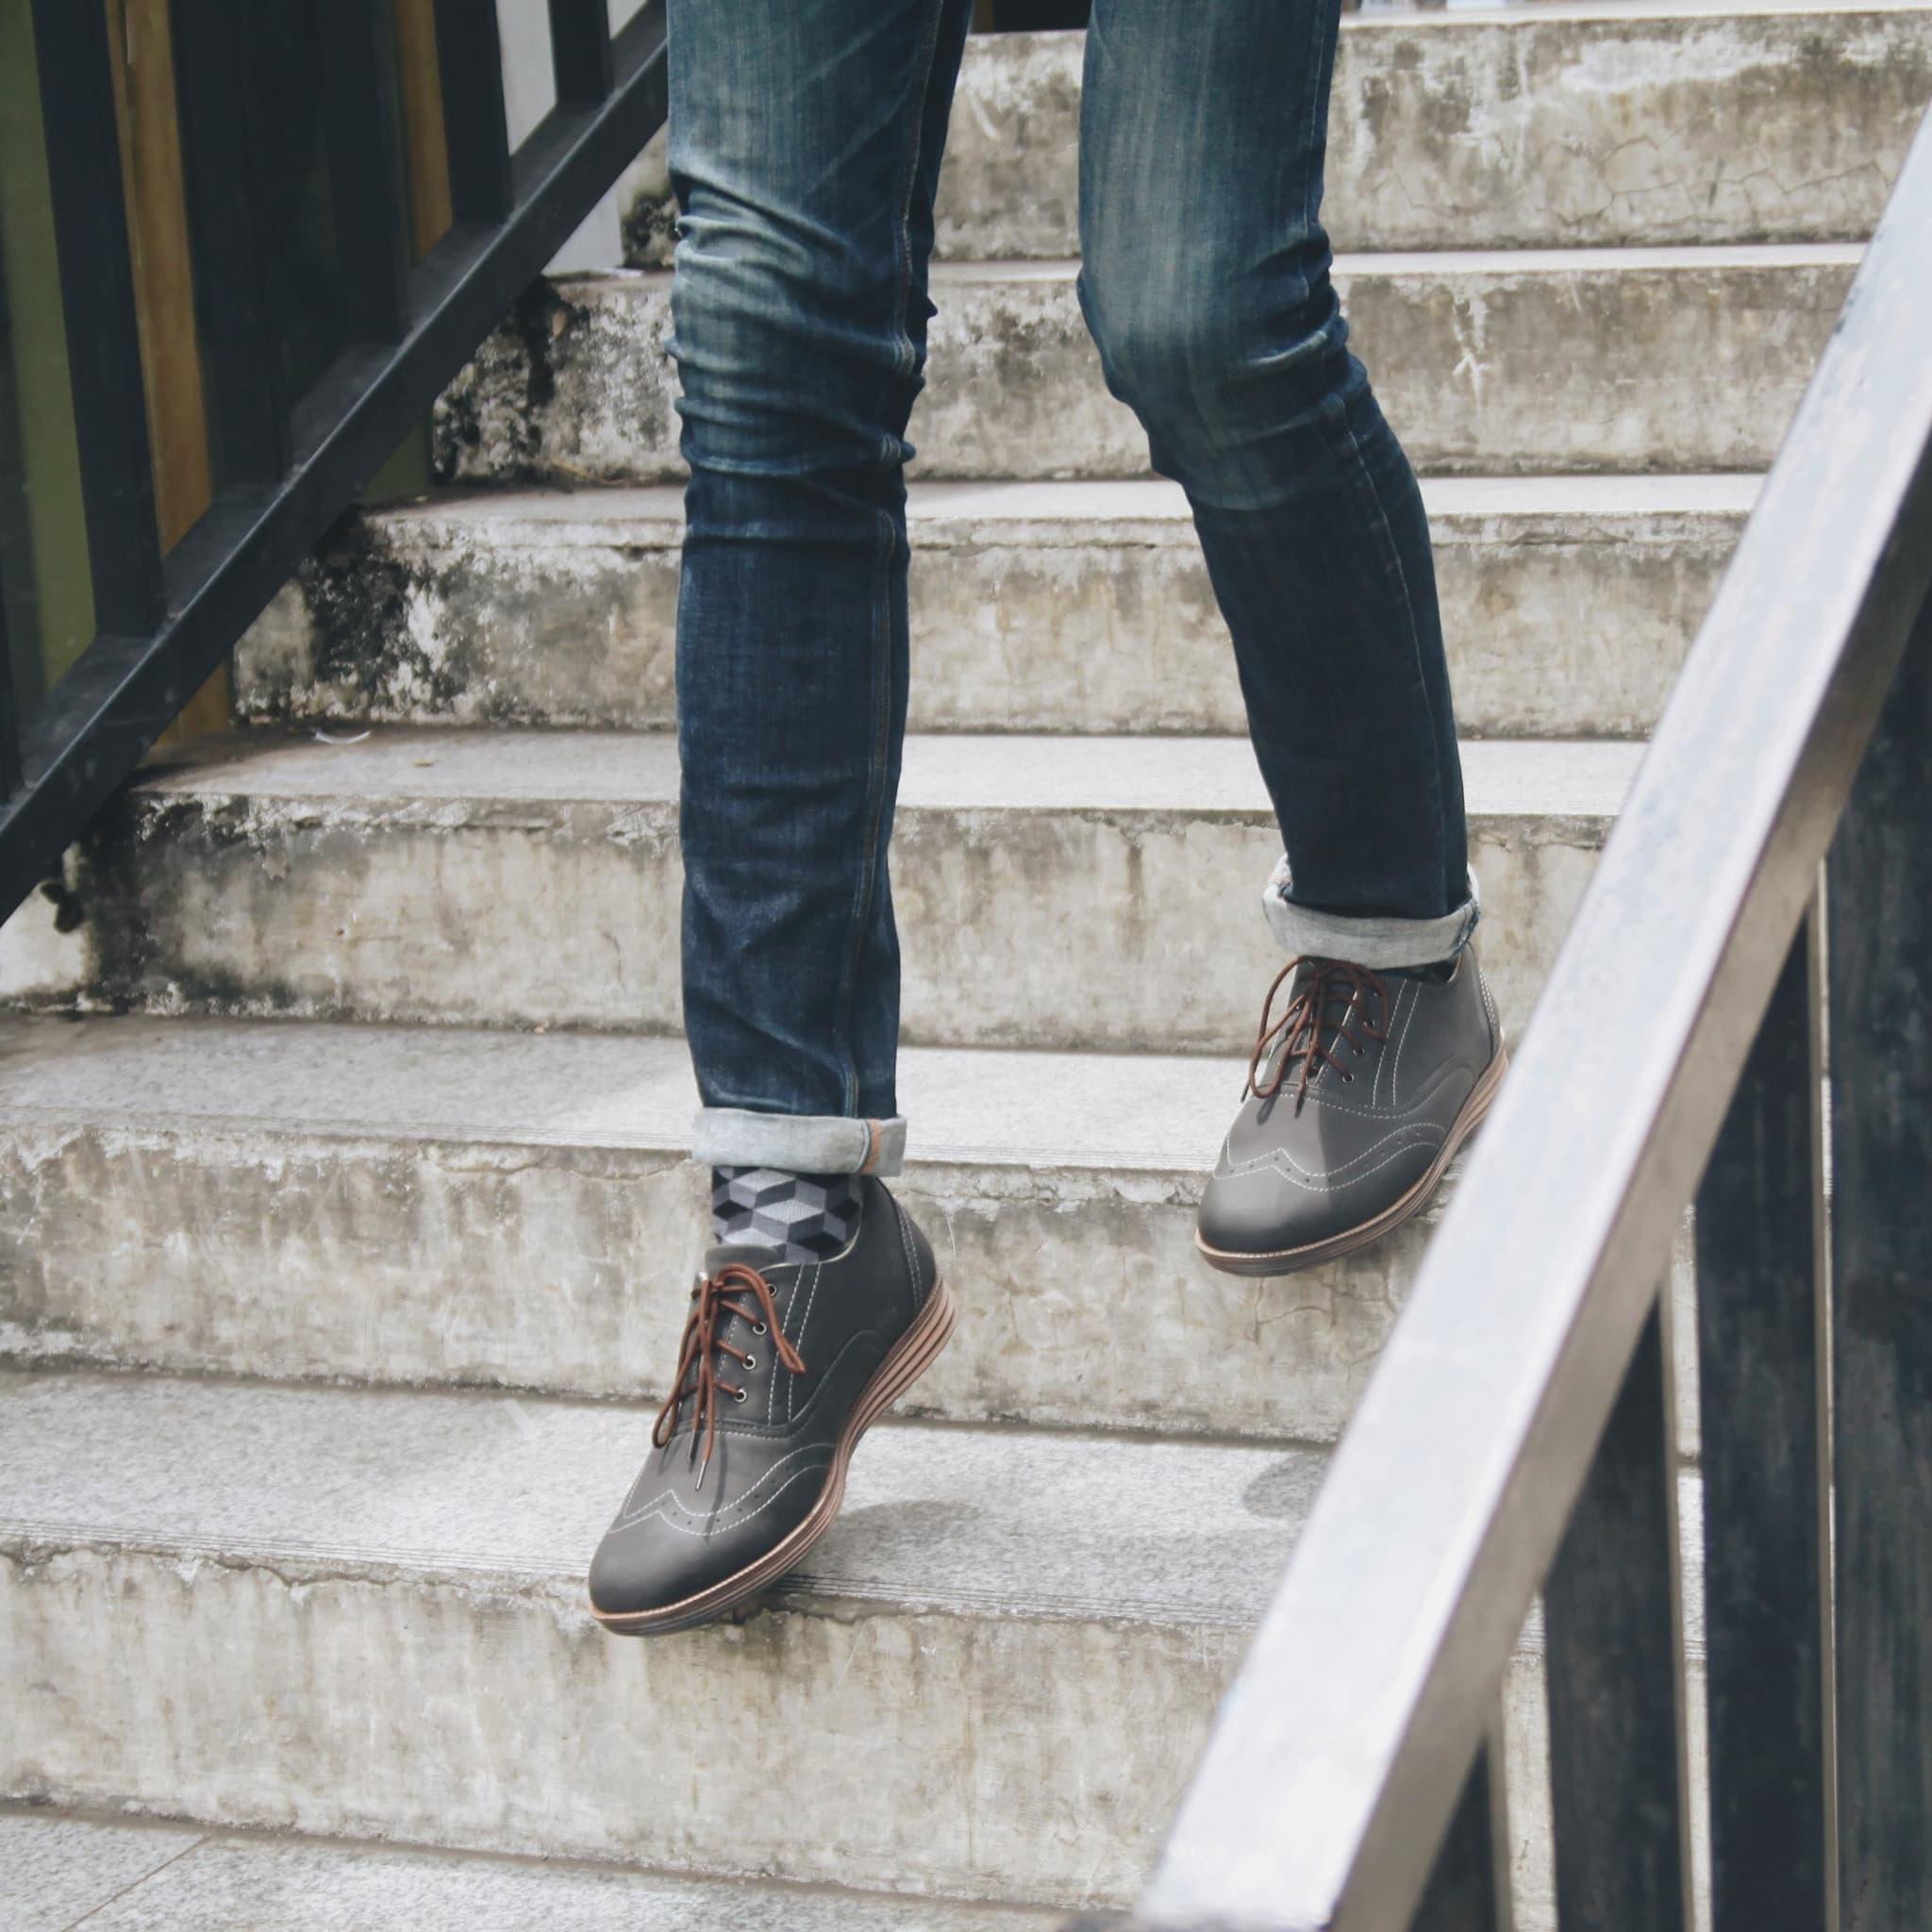 Jual Headway Footwear 09 New Grow Brown Sepatu Handmade Bandung Semi Boots 32 Covey Black